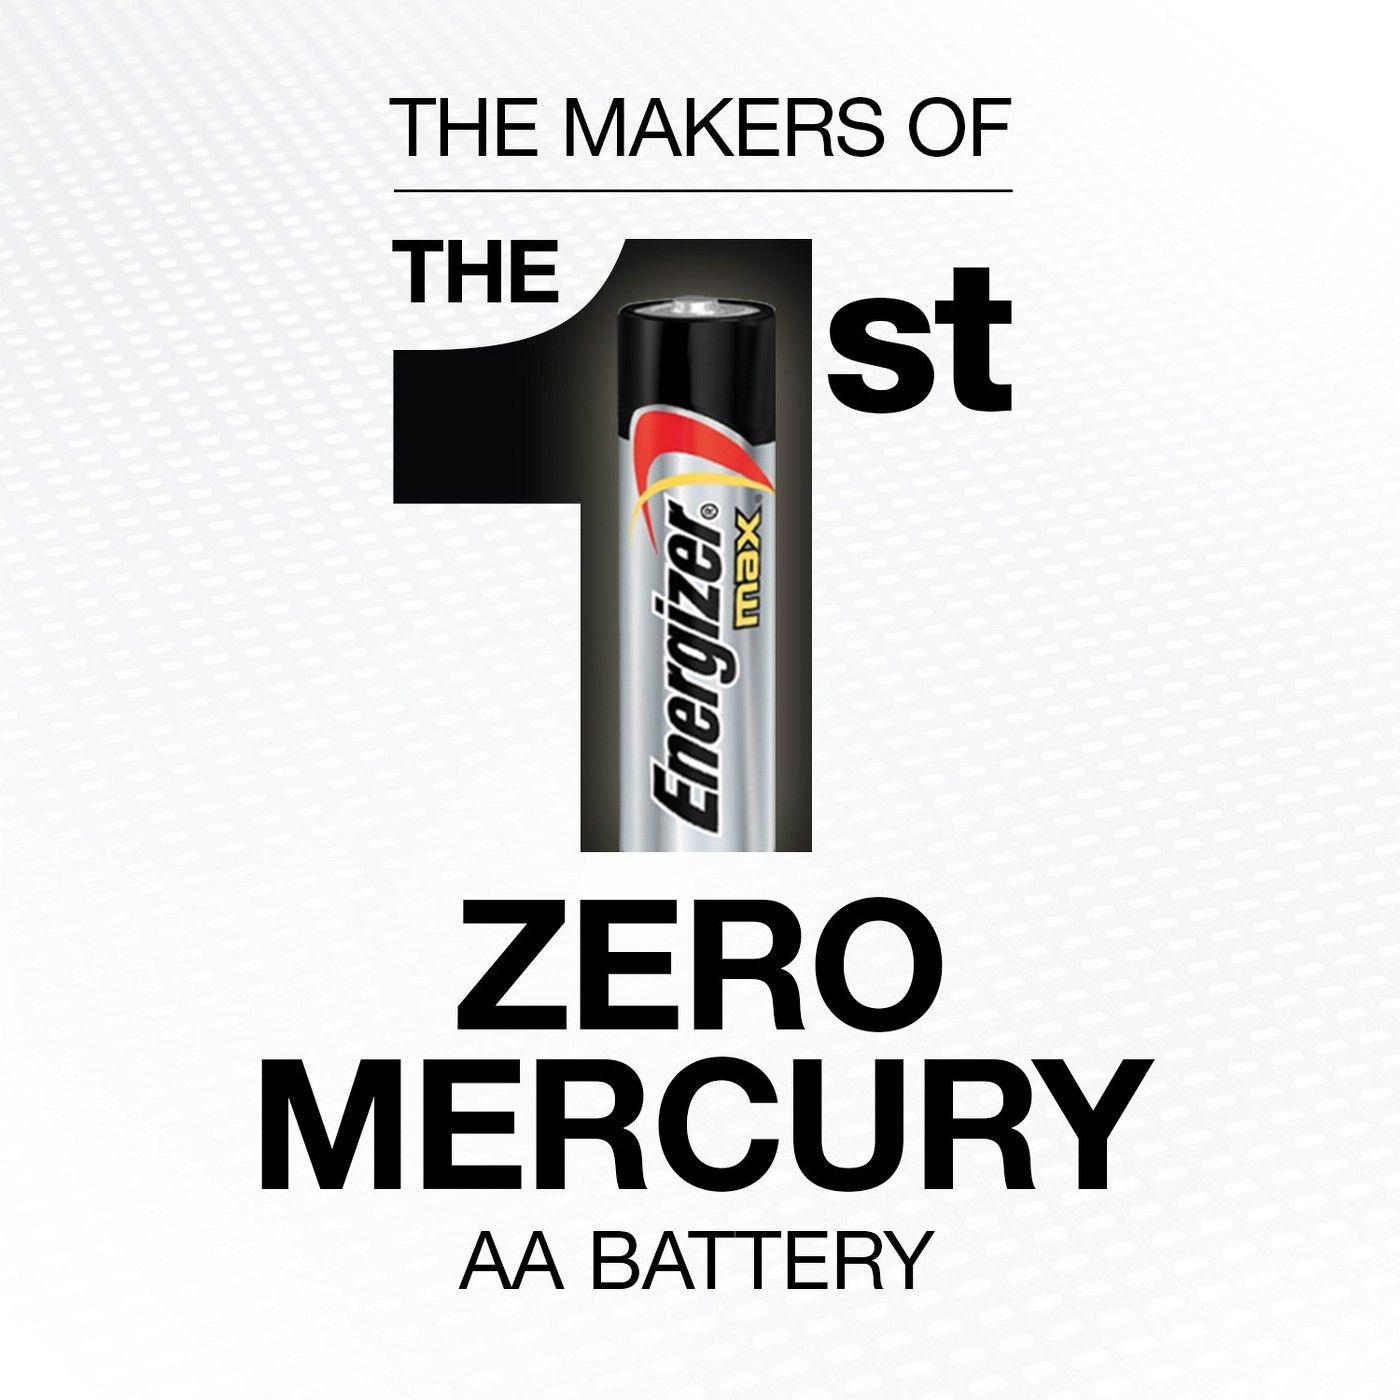 Energizer 4pk Max Alkaline D Batteries Energizer Energizer Battery Alkaline Battery